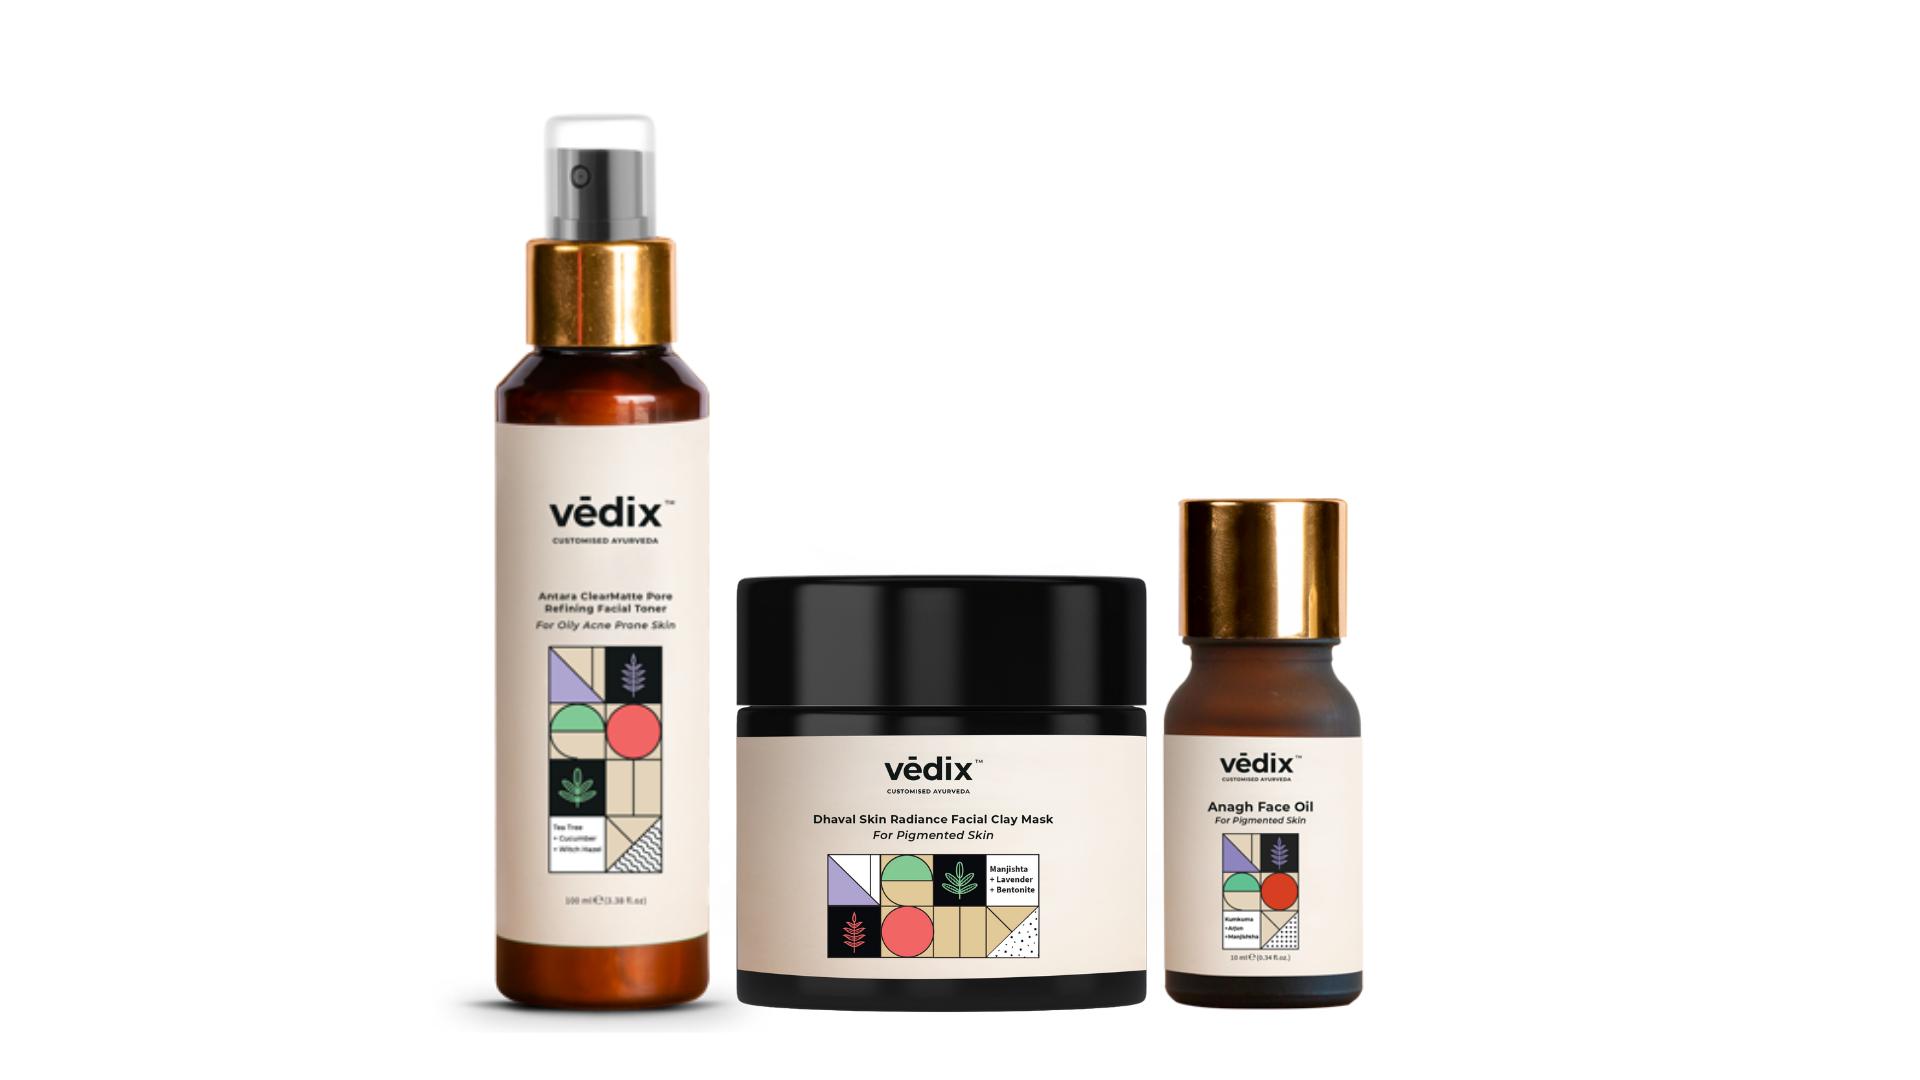 Vedix face oils, toners, face masks